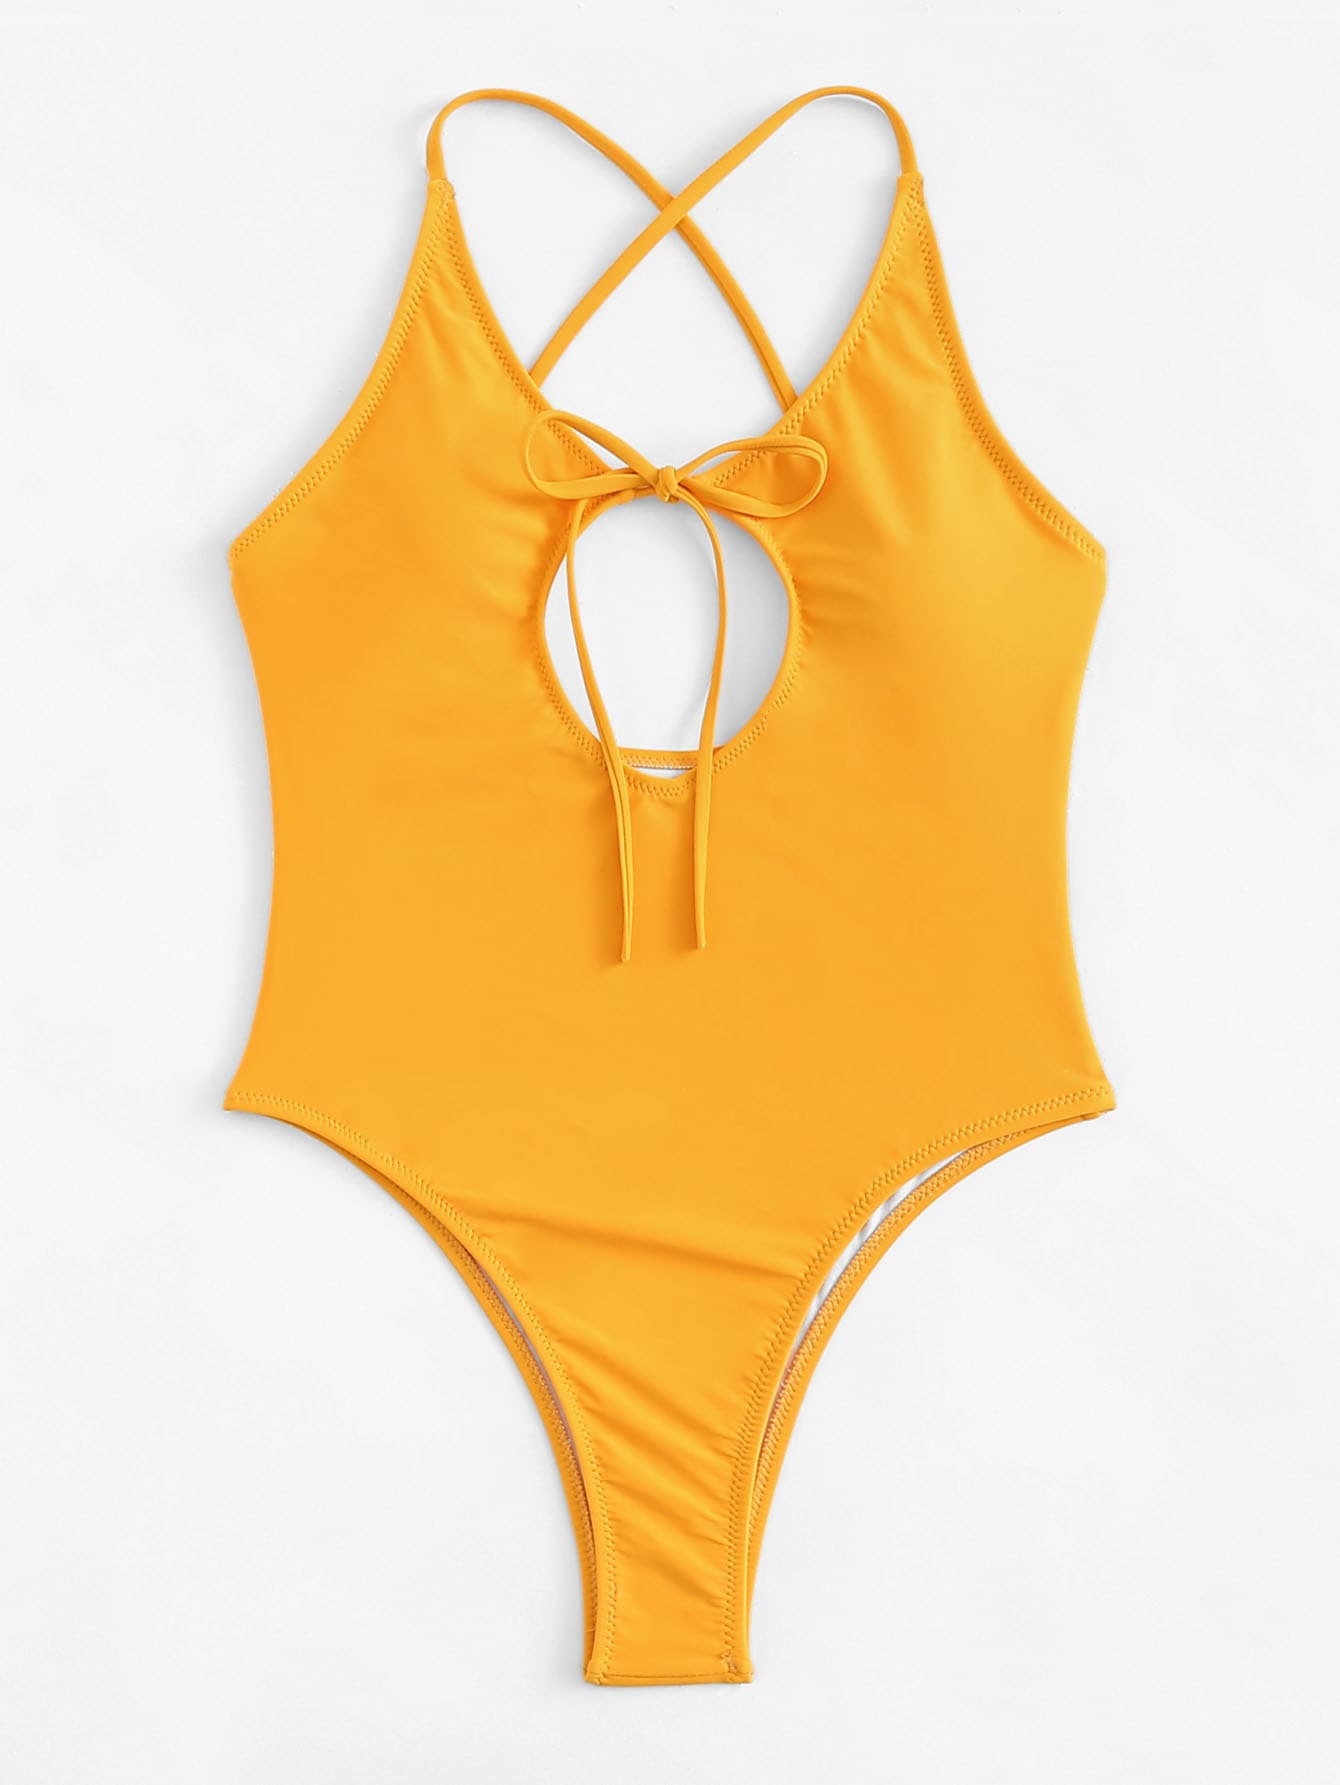 Cut-Out Criss Cross Swimsuit criss cross cut out lace crop top